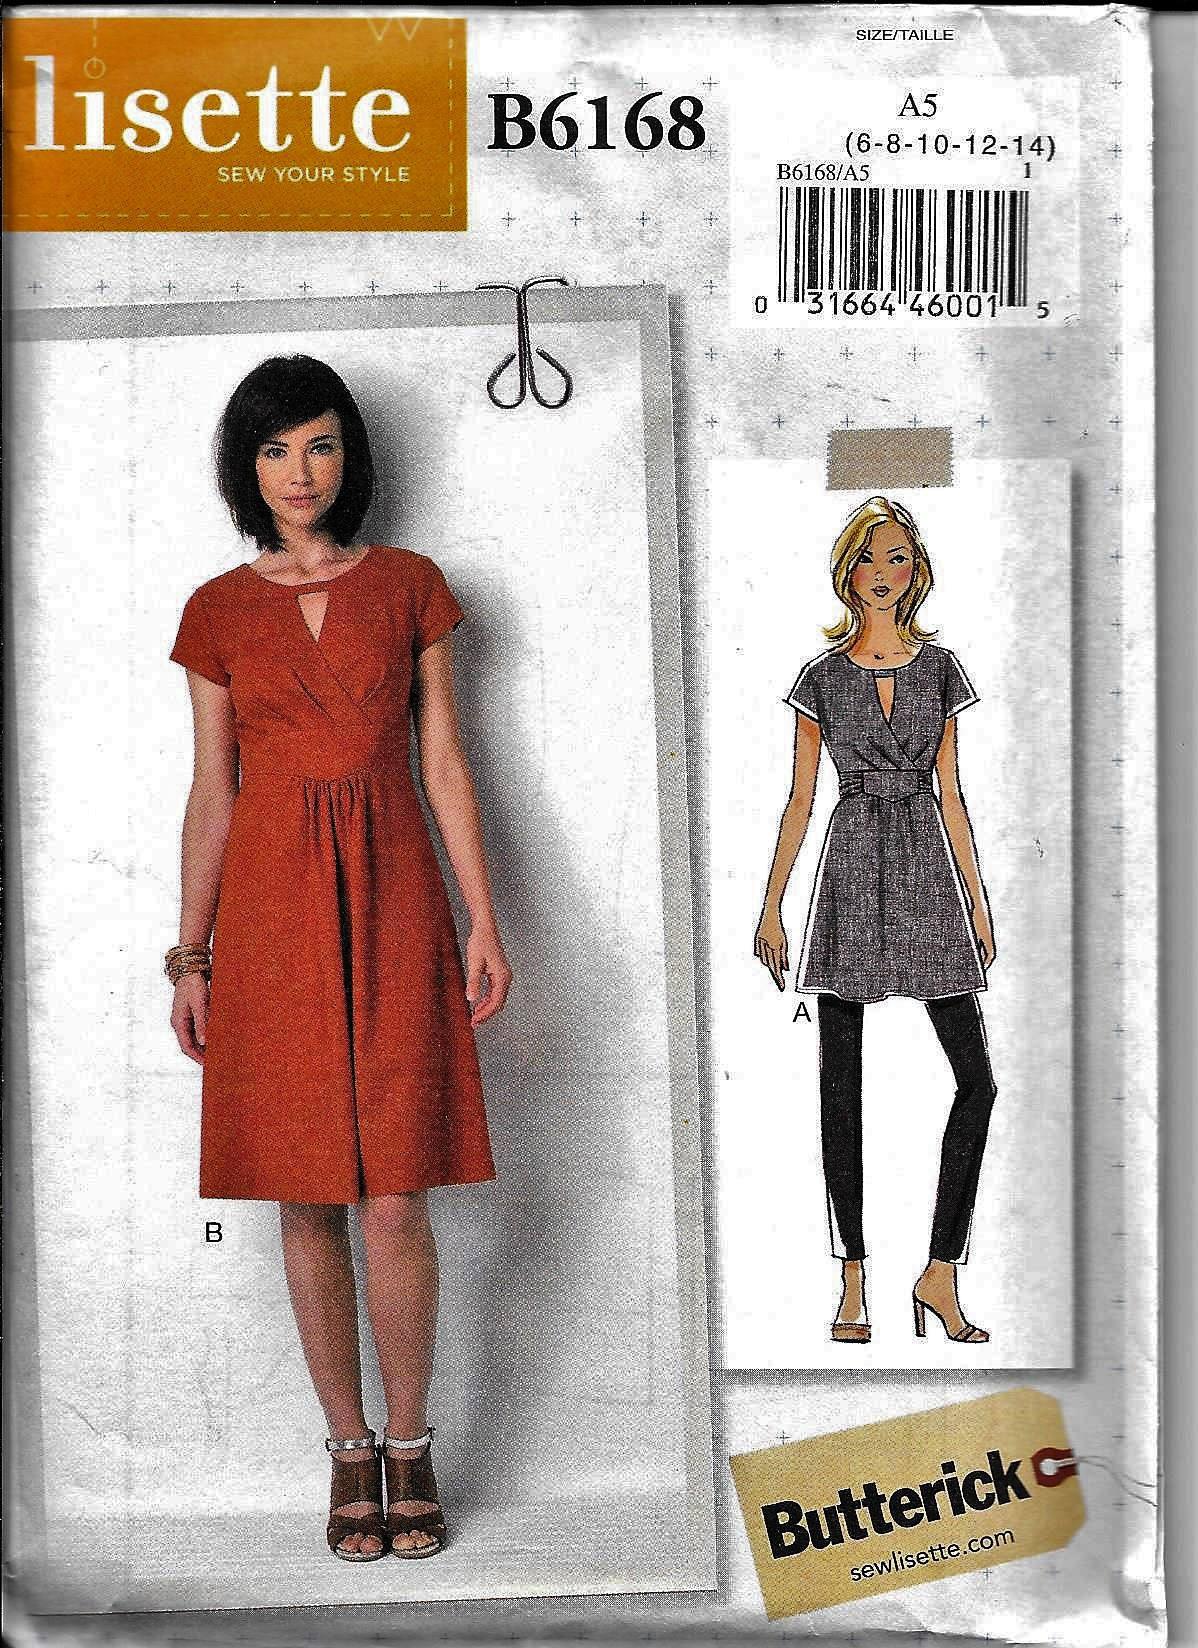 Butterick B6168 LISETTE Kleid oder Tunika Nähen Muster